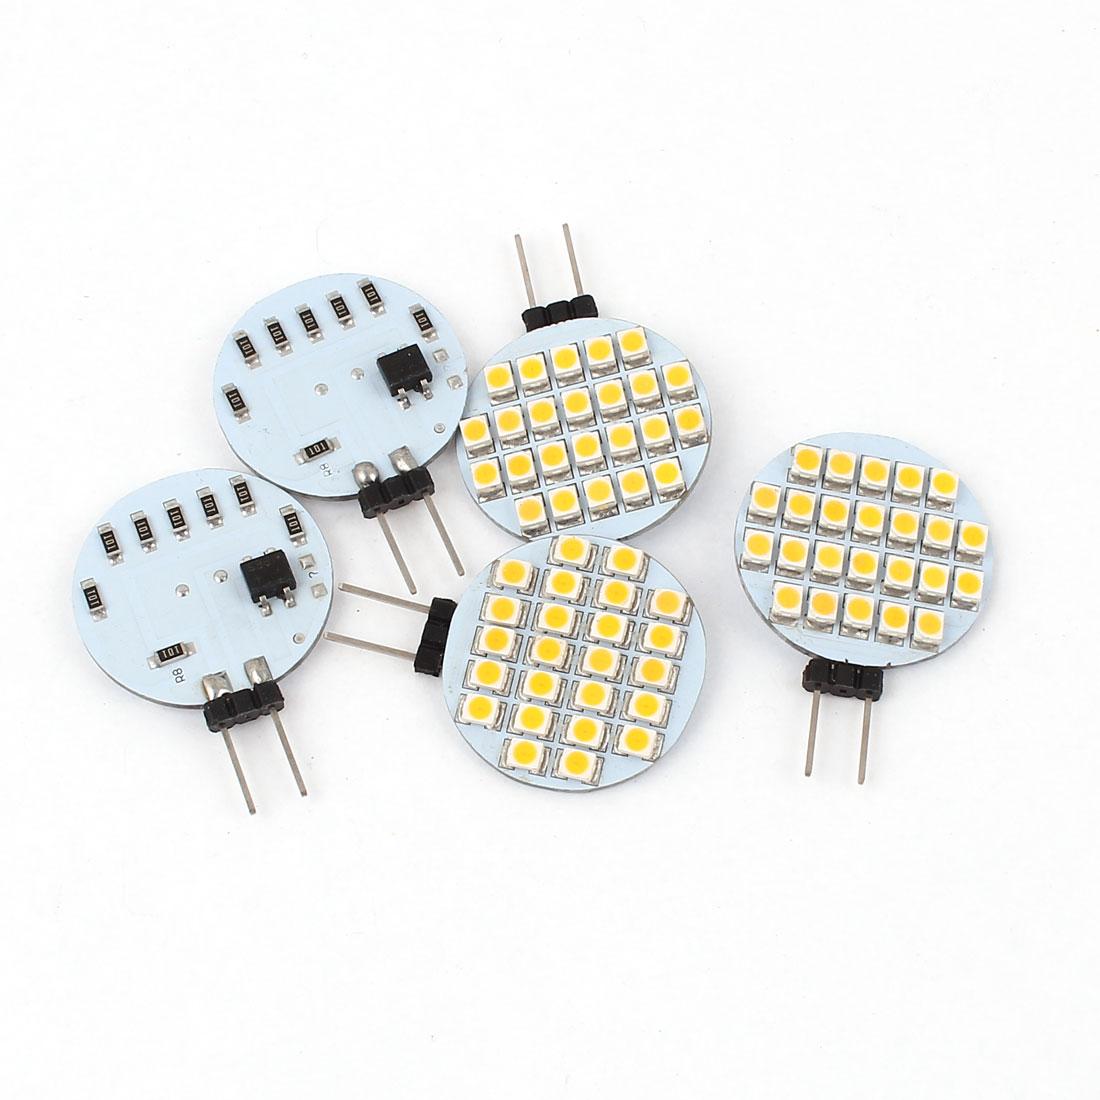 5 x 70-80LM Energy Saving G4 3528 SMD 24 LED Light Bulb Lamp Warm White